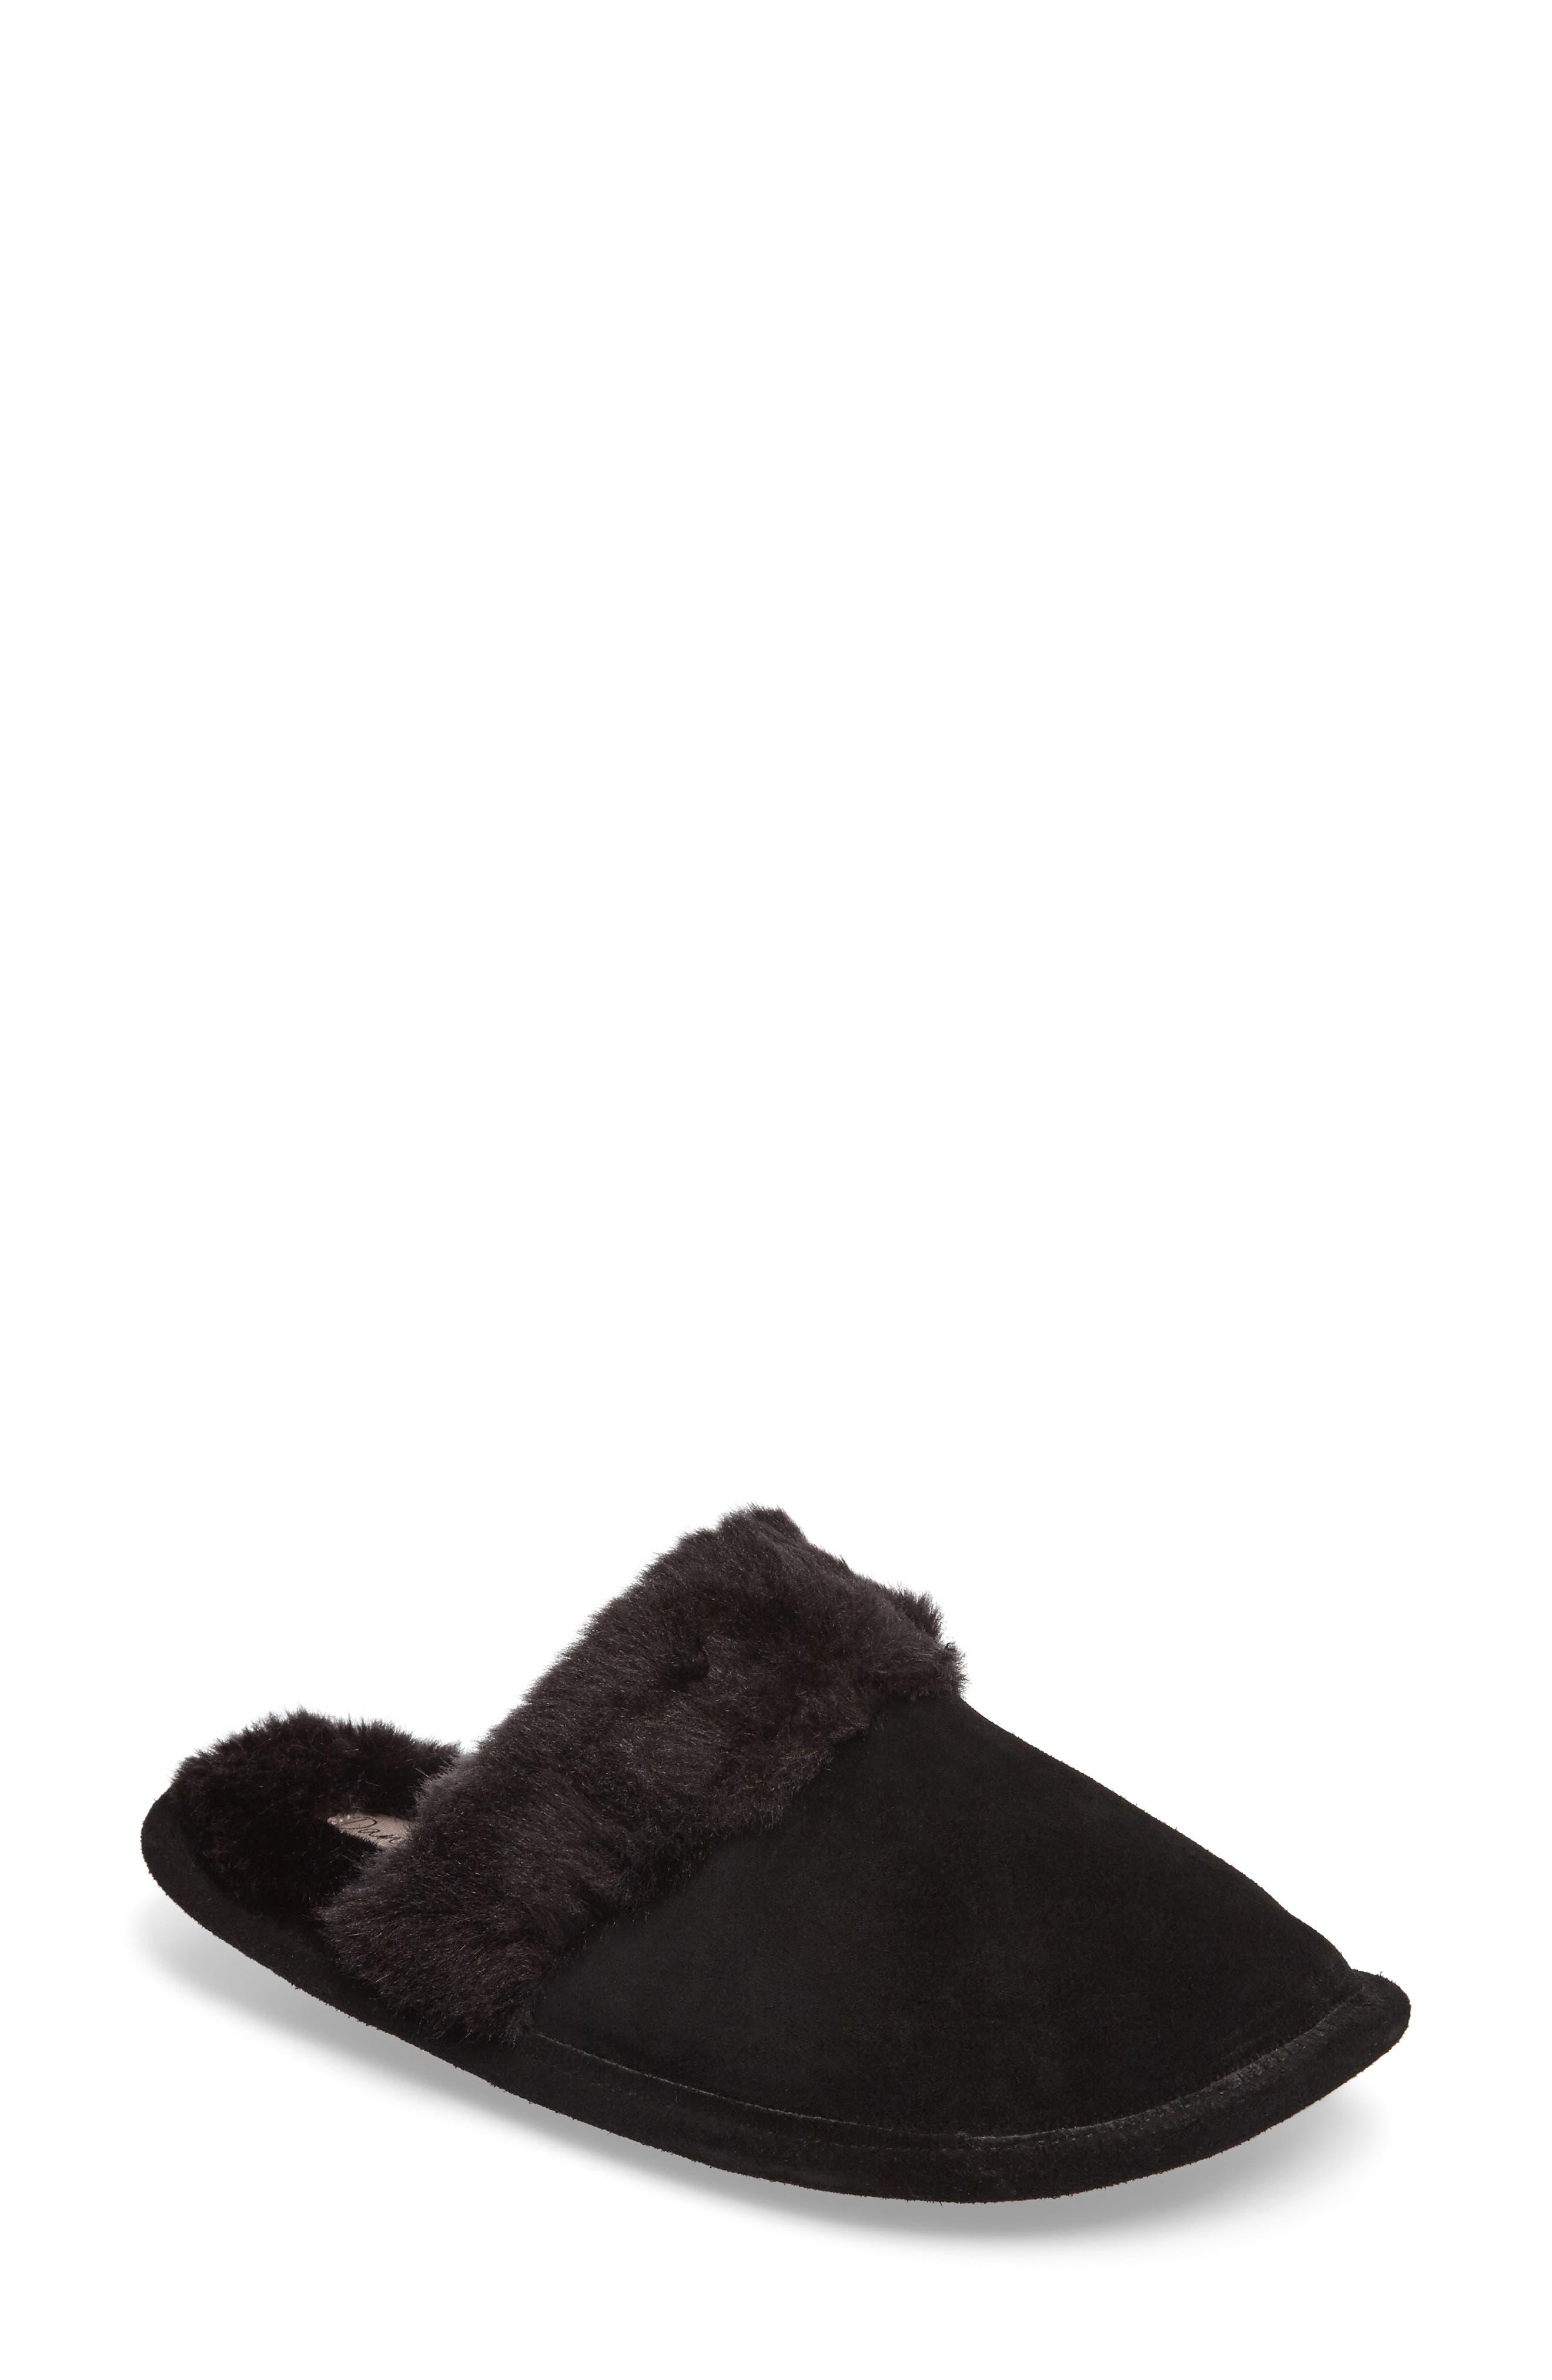 Alternate Image 1 Selected - Daniel Green Pammy Faux Fur Slipper